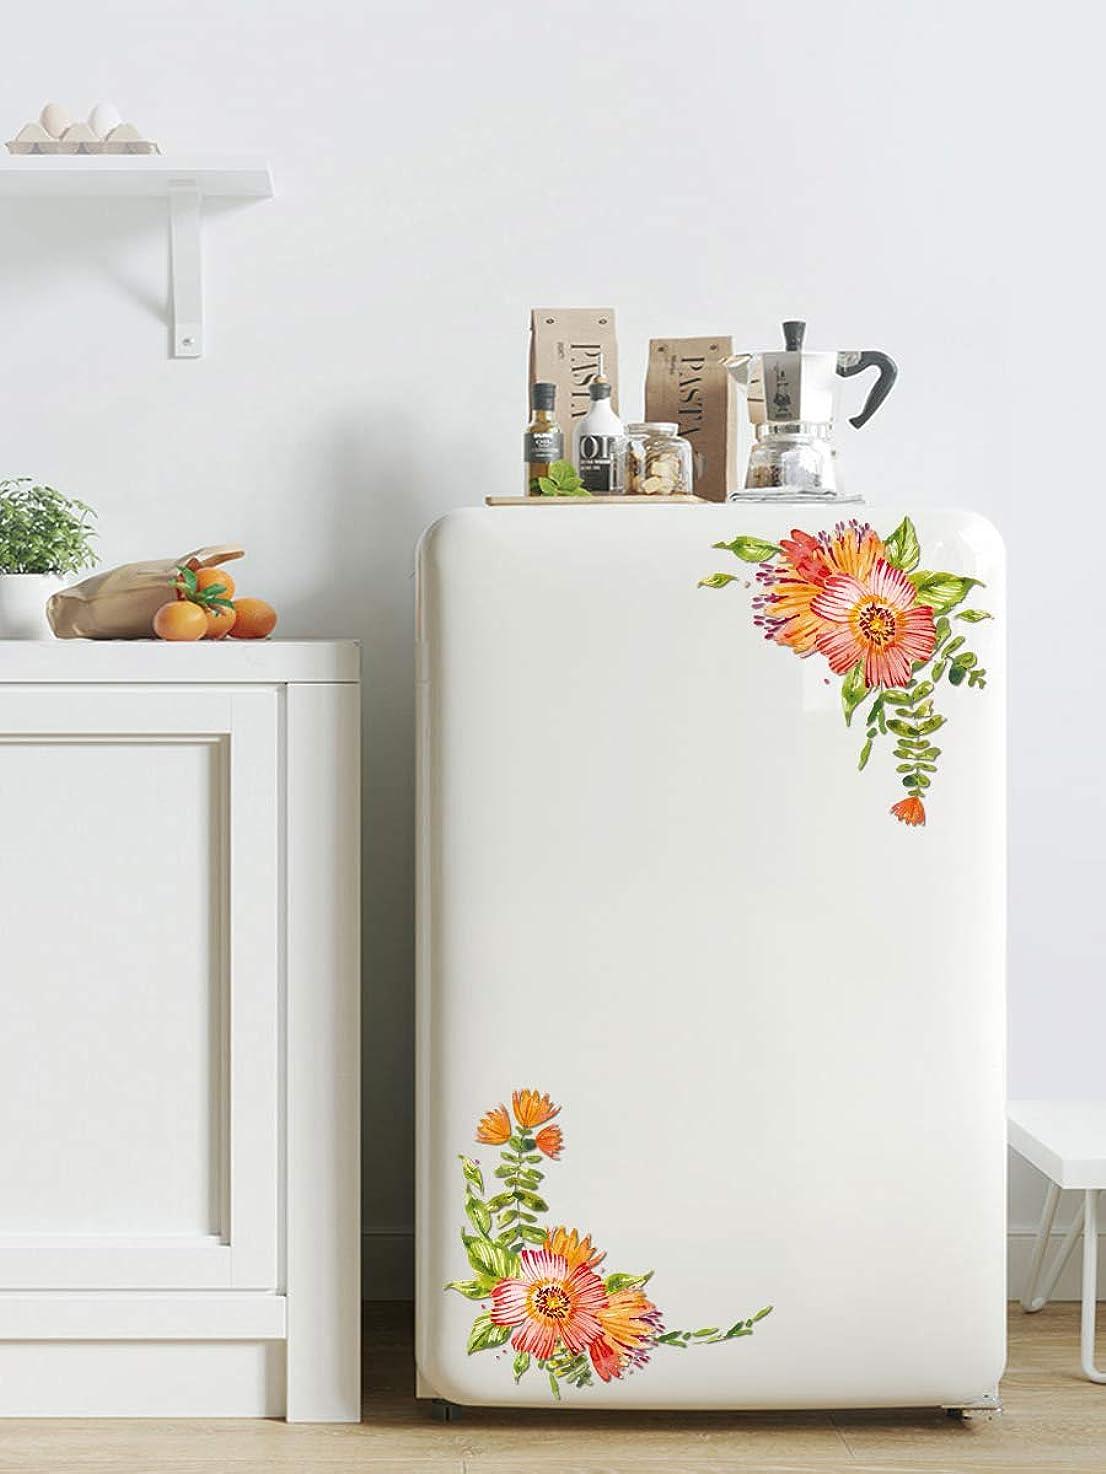 VANCORE Flower Stickers Refrigerator,Toilet Stickers,Toilet Decals, Refrigerator Stickers Holiday Christmas Decorations Fridge, Door, Window, Office Cabinets